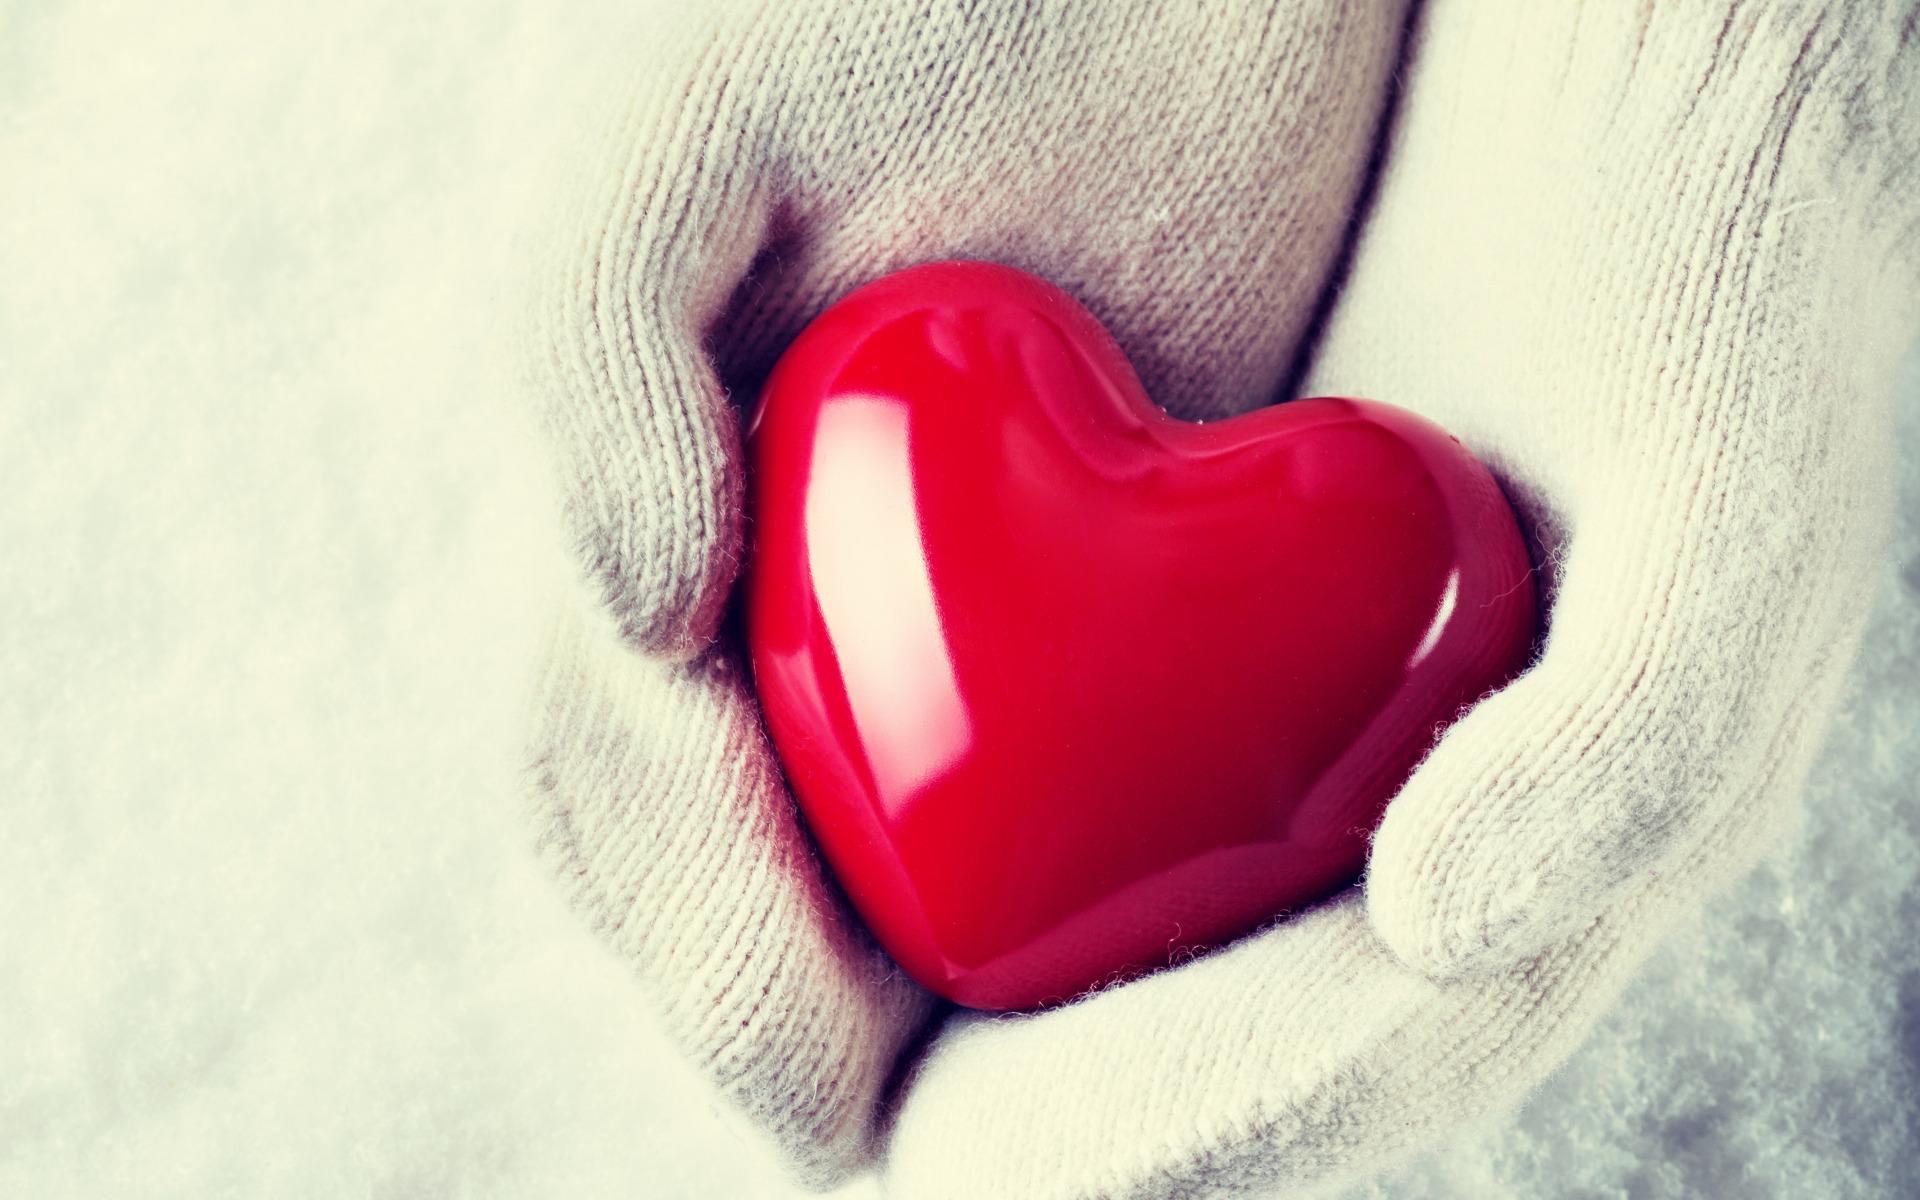 Сердце в ладошках  № 923379 без смс